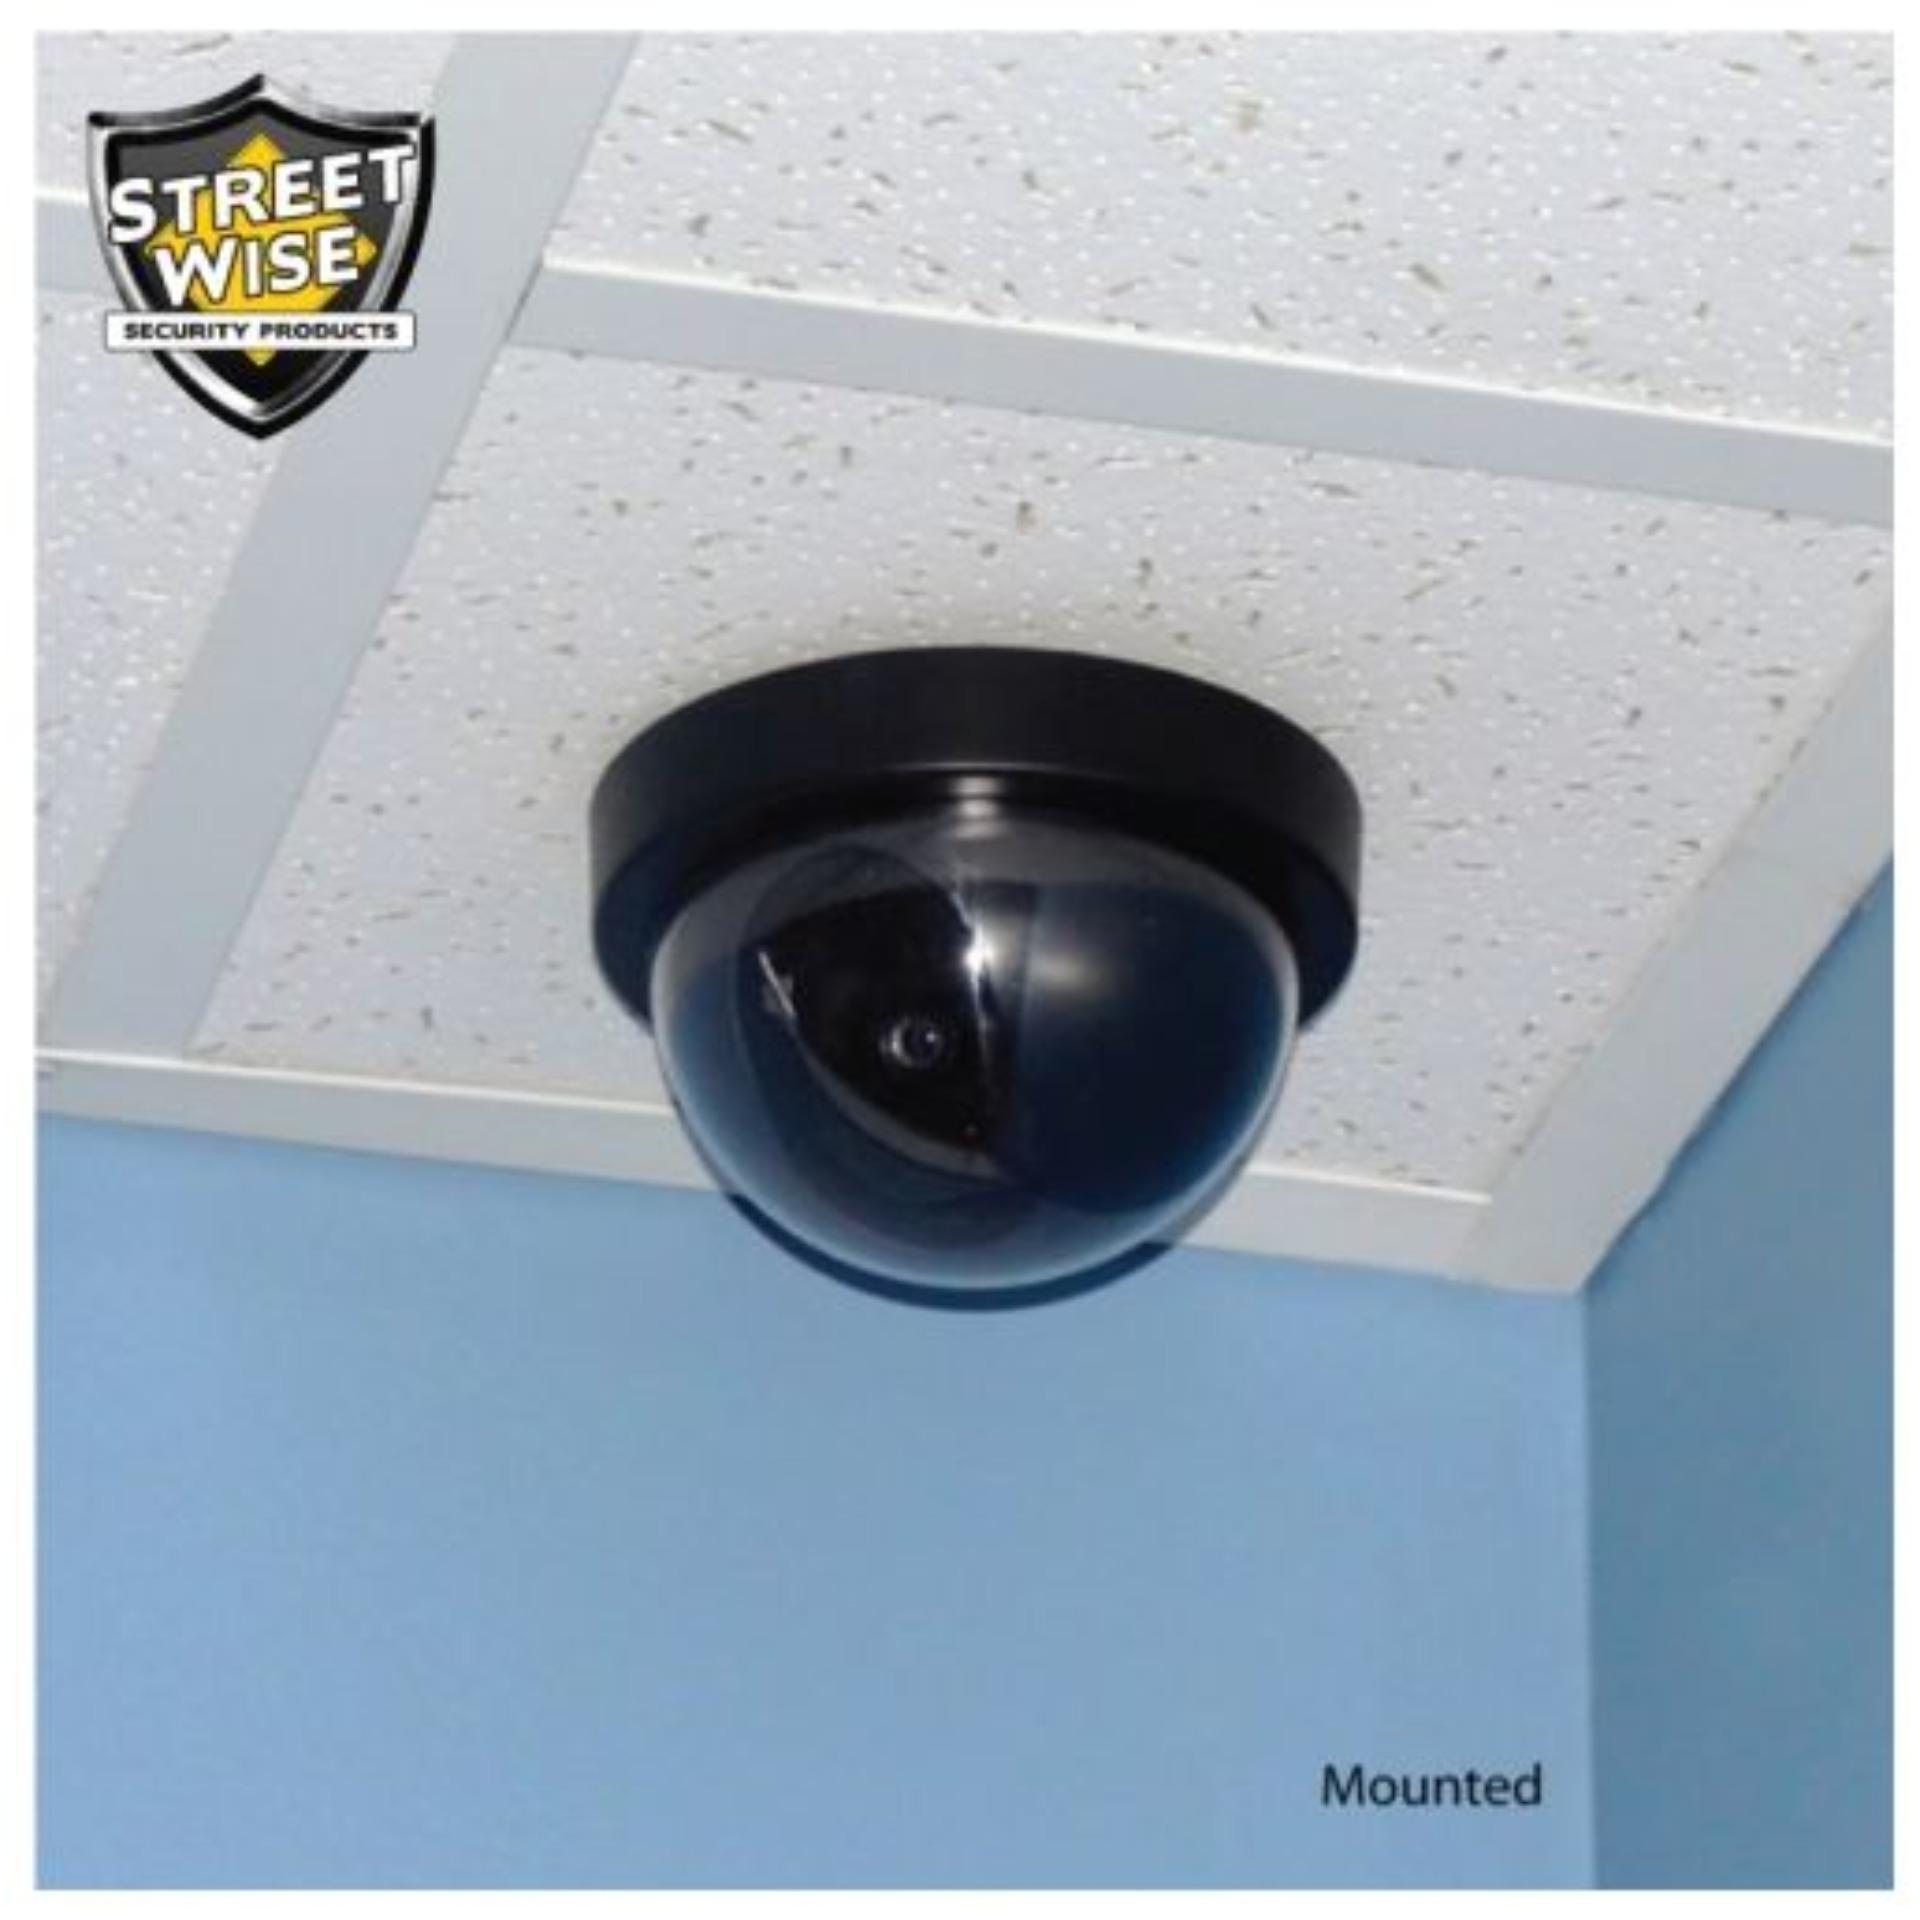 ... Unique CCTV Dummy Lampu LED Kedip Fake Security Camera Anti Maling CCTV Palsu Replika Mirip Asli ...